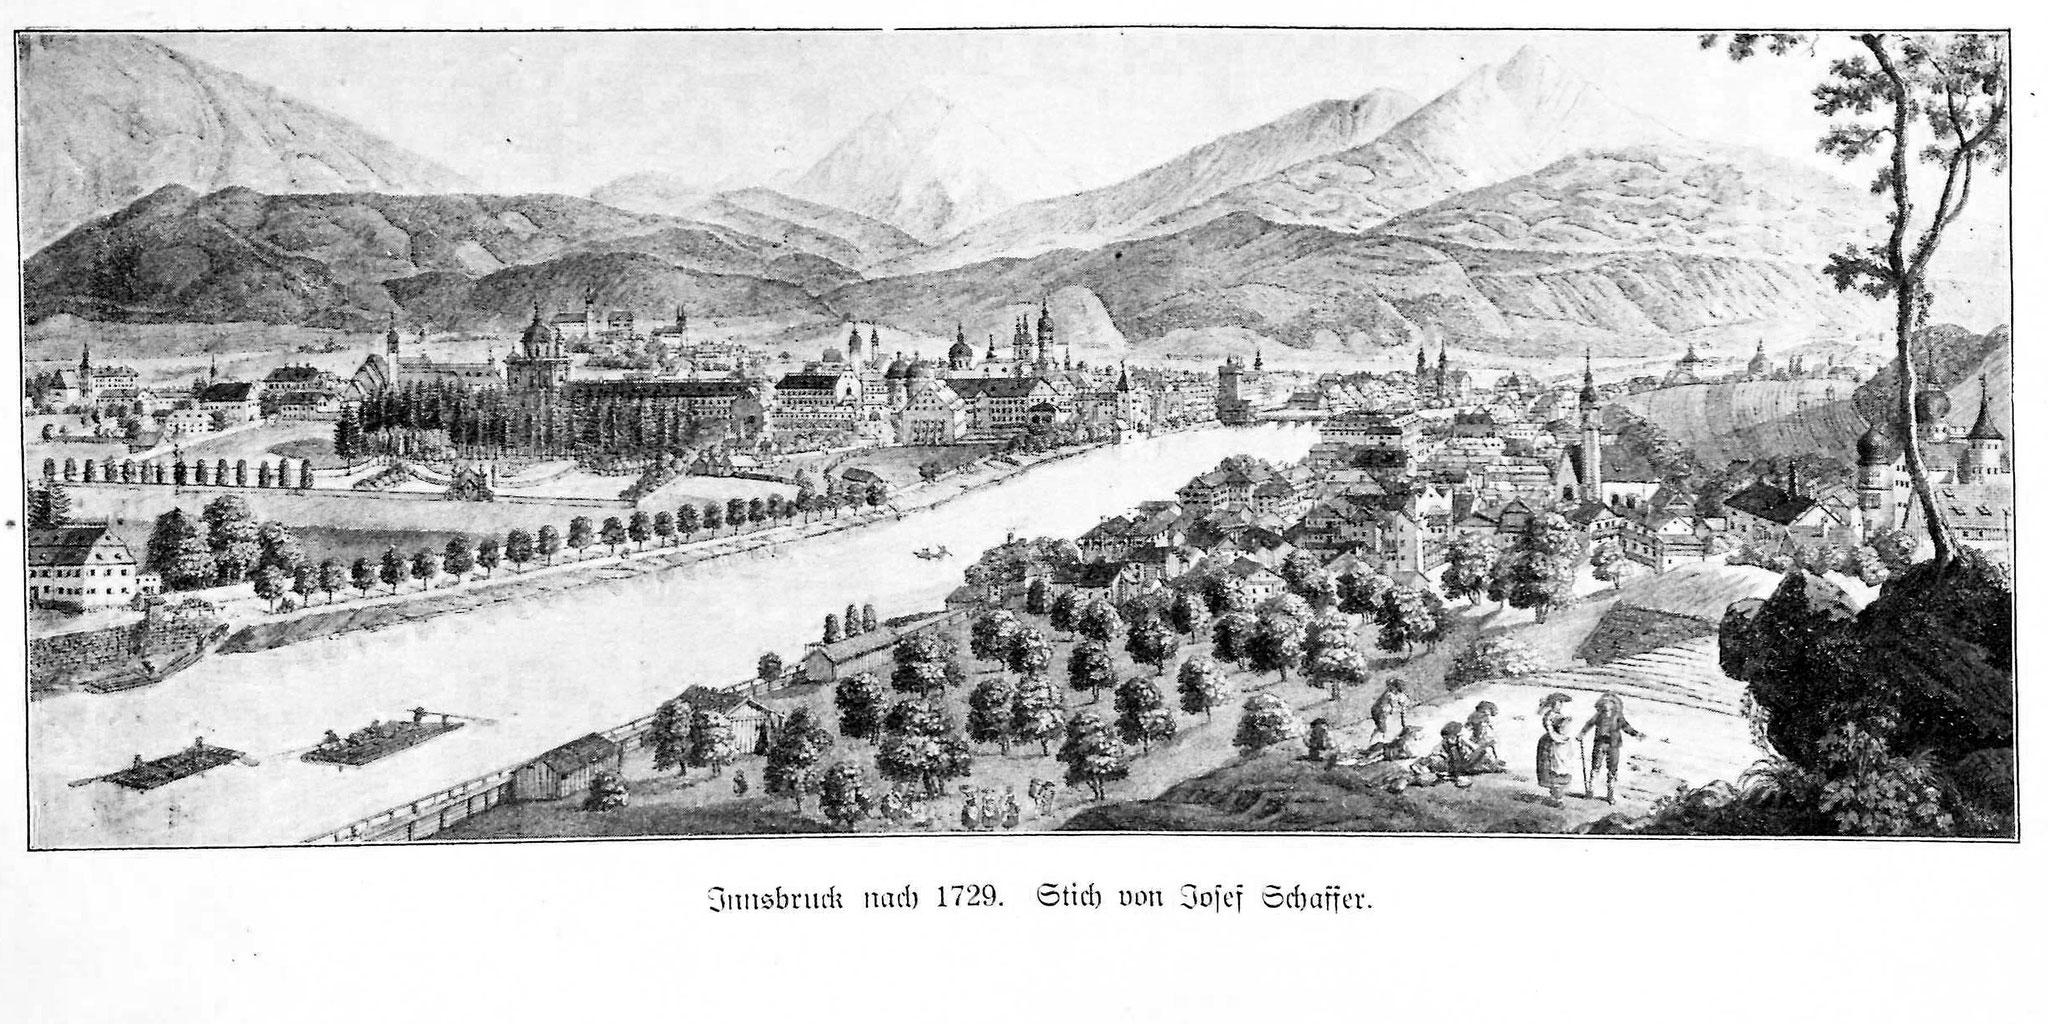 Innsbruck 1729